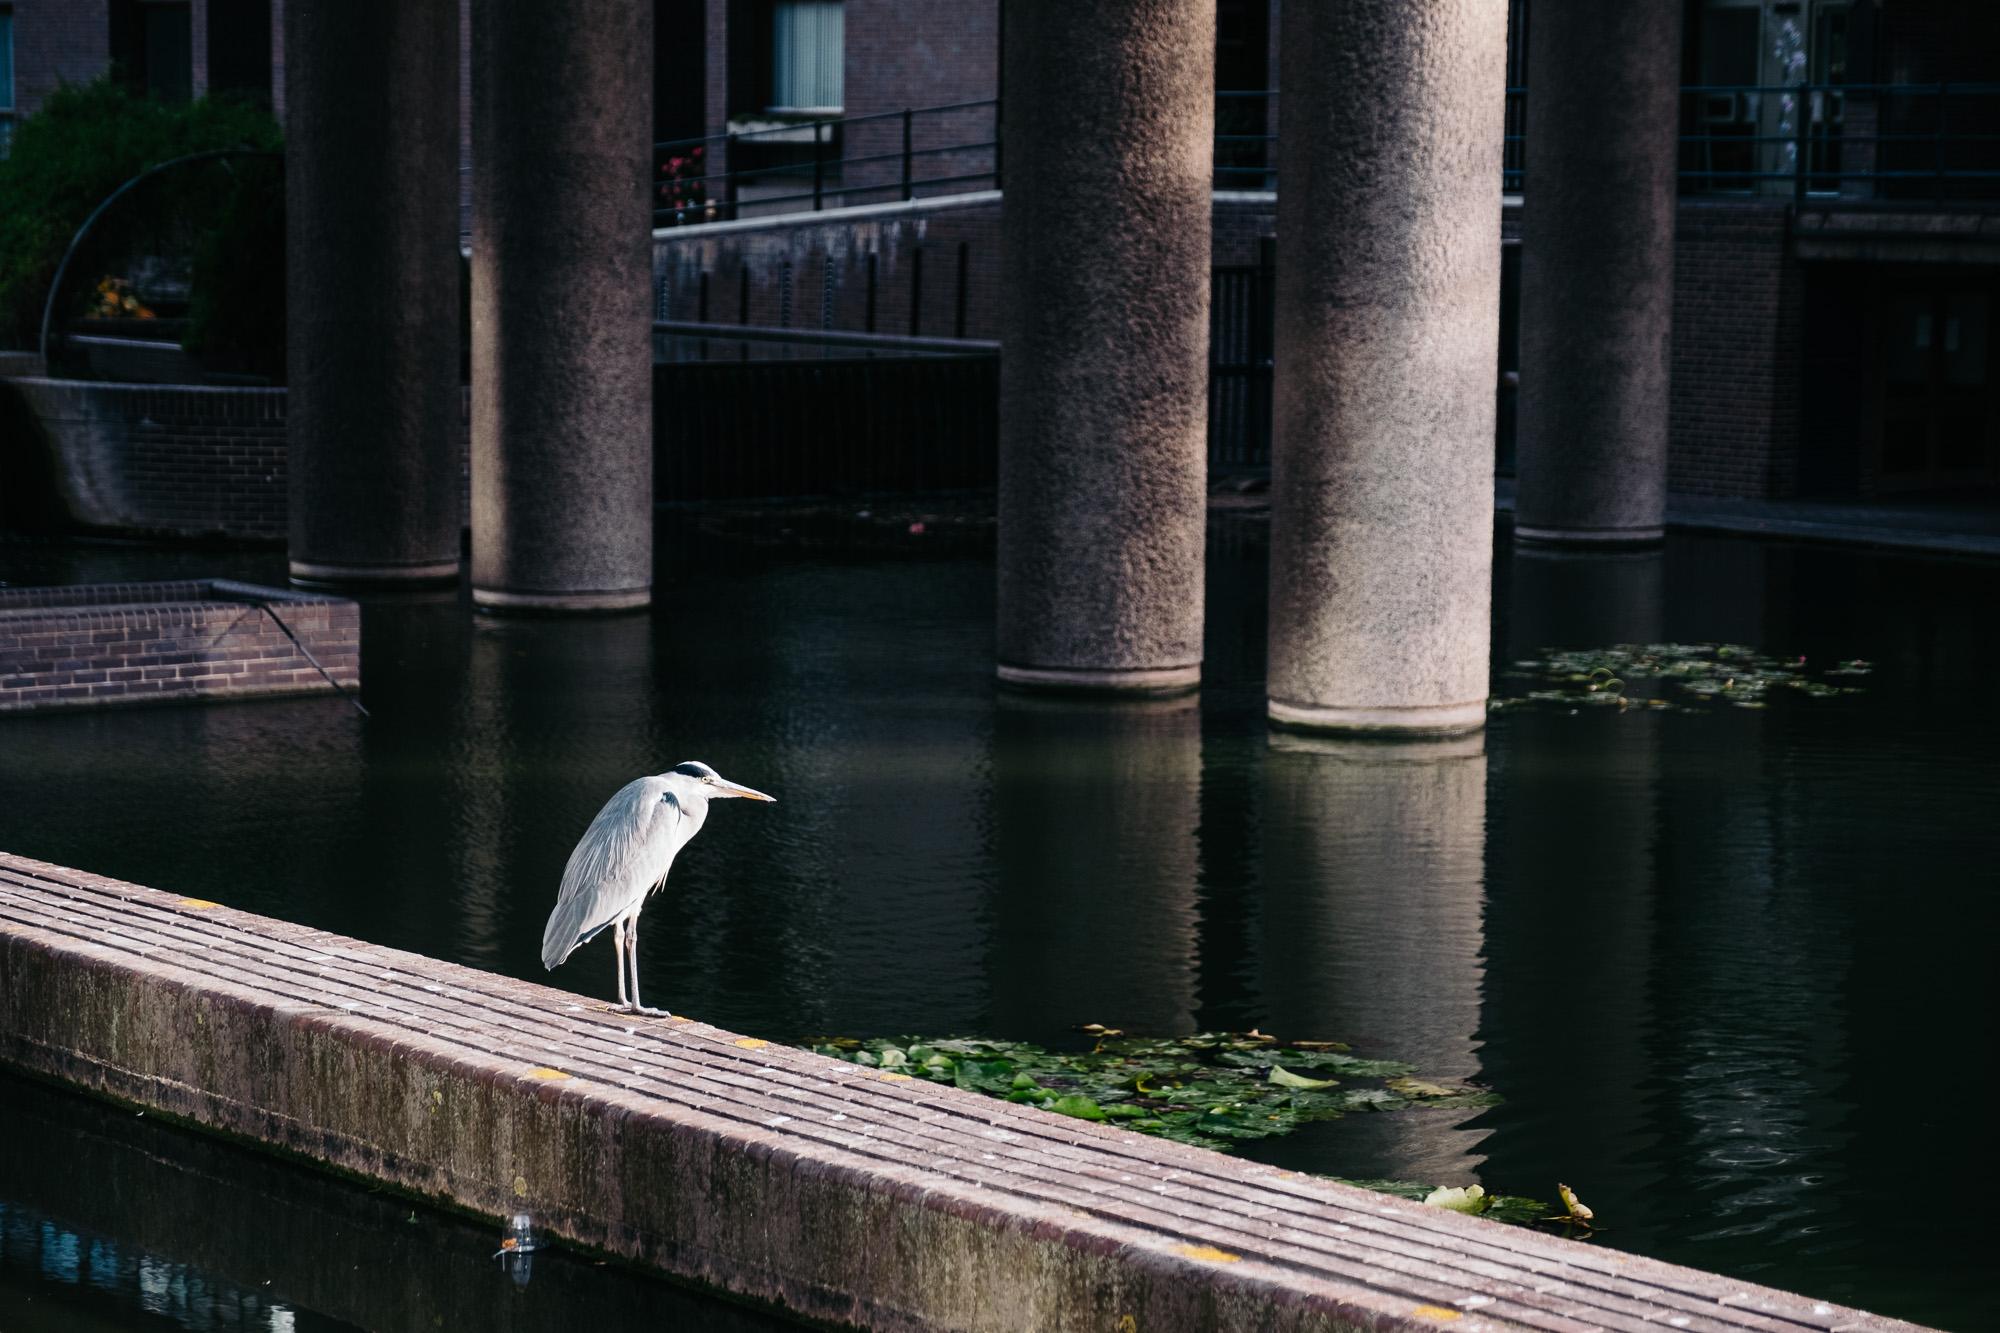 Heron at Barbican Centre © Andrew Newson